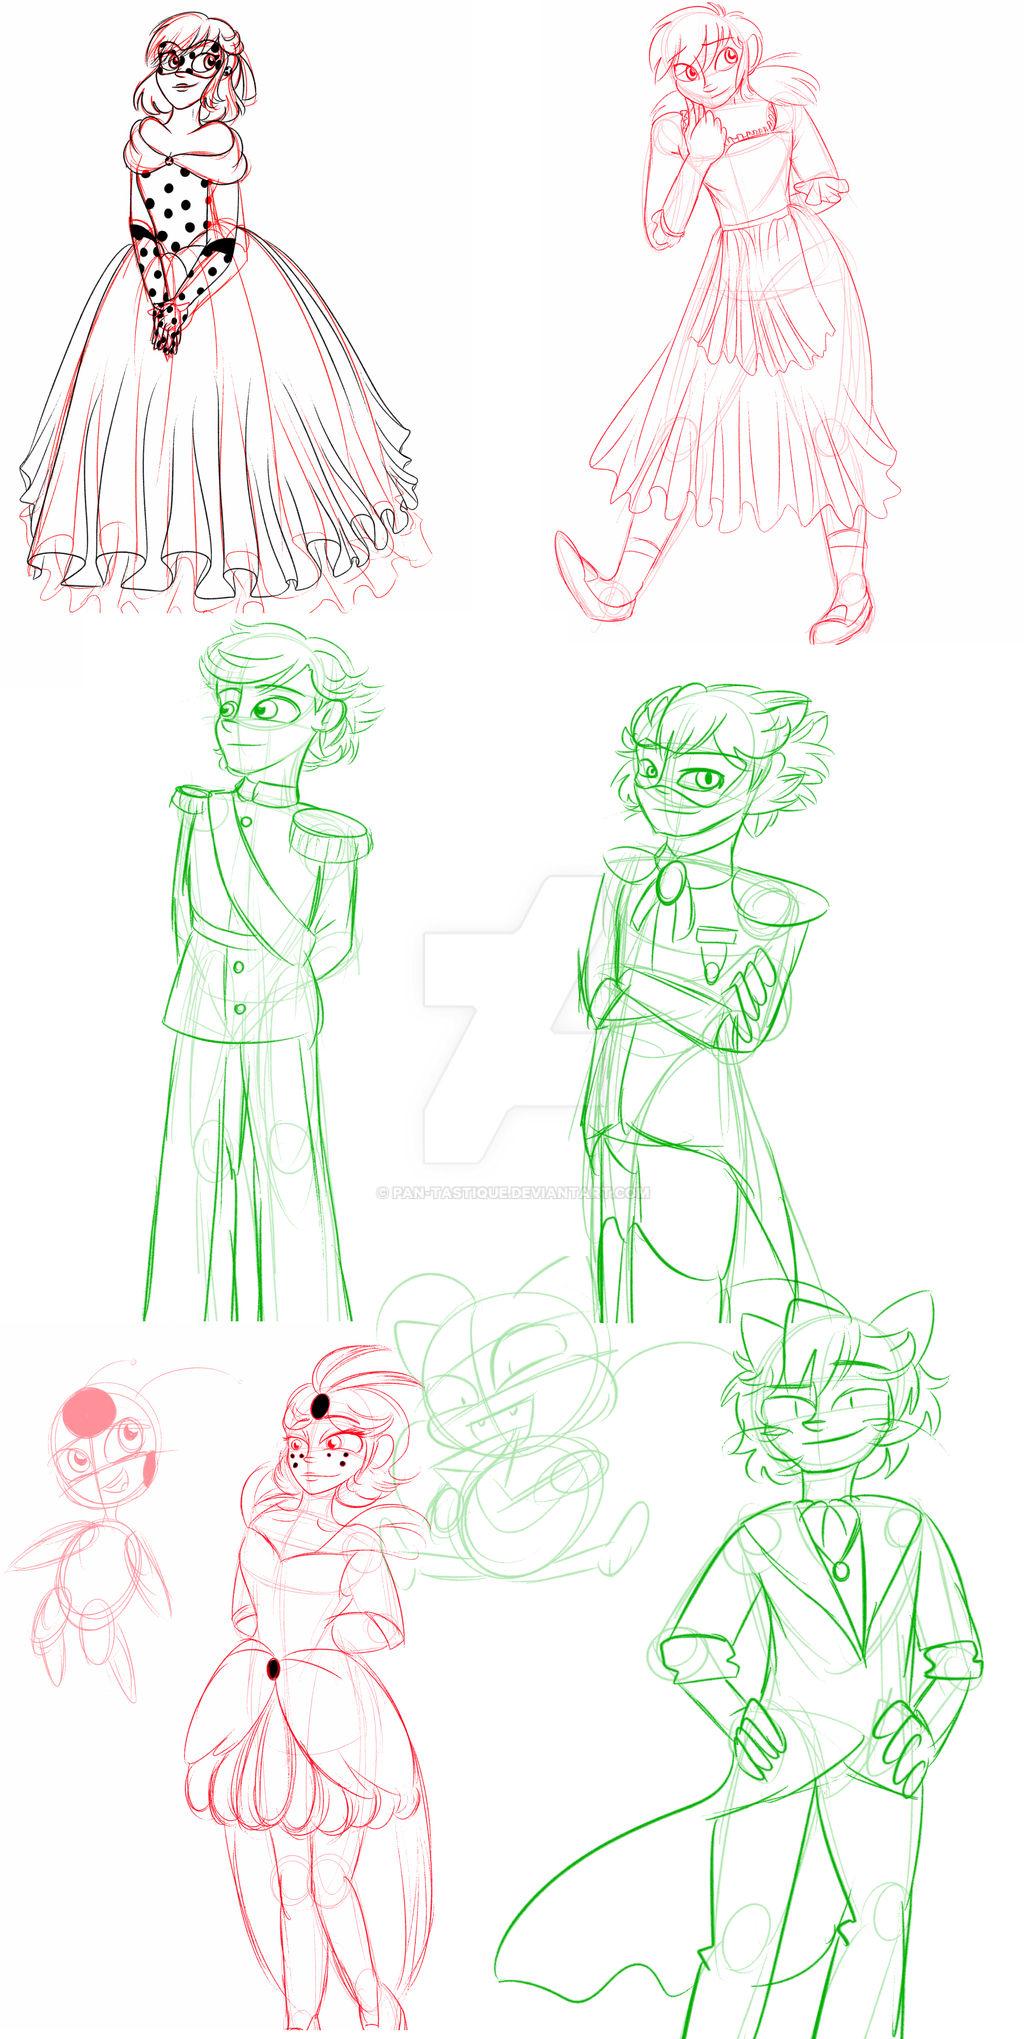 .:Cinderella AU Character Sketches:.